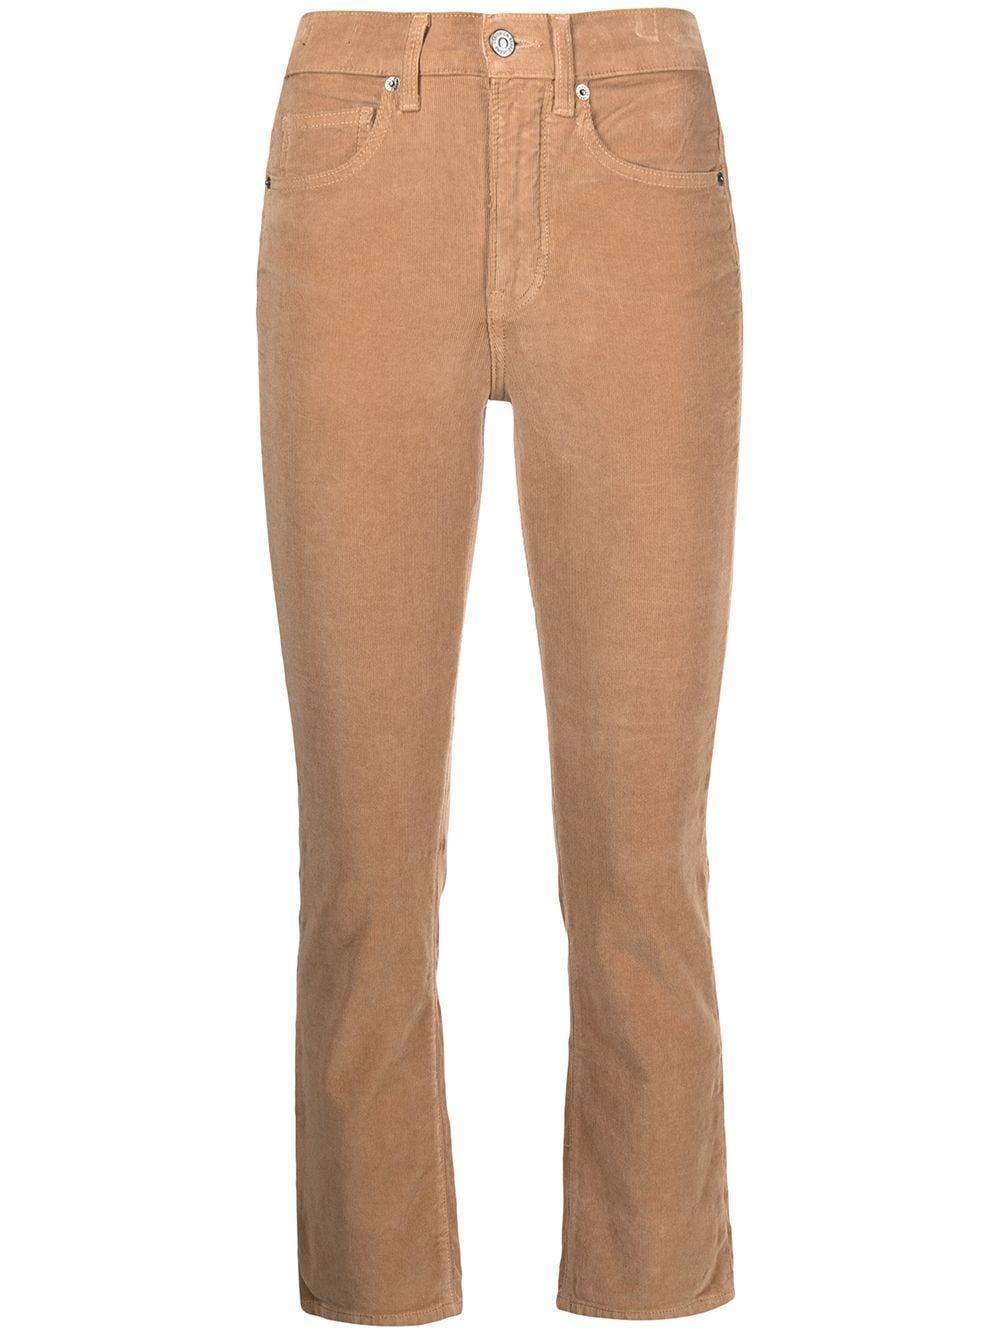 Carly Kick Flare Corduroy Pant Item # J21083580276CE